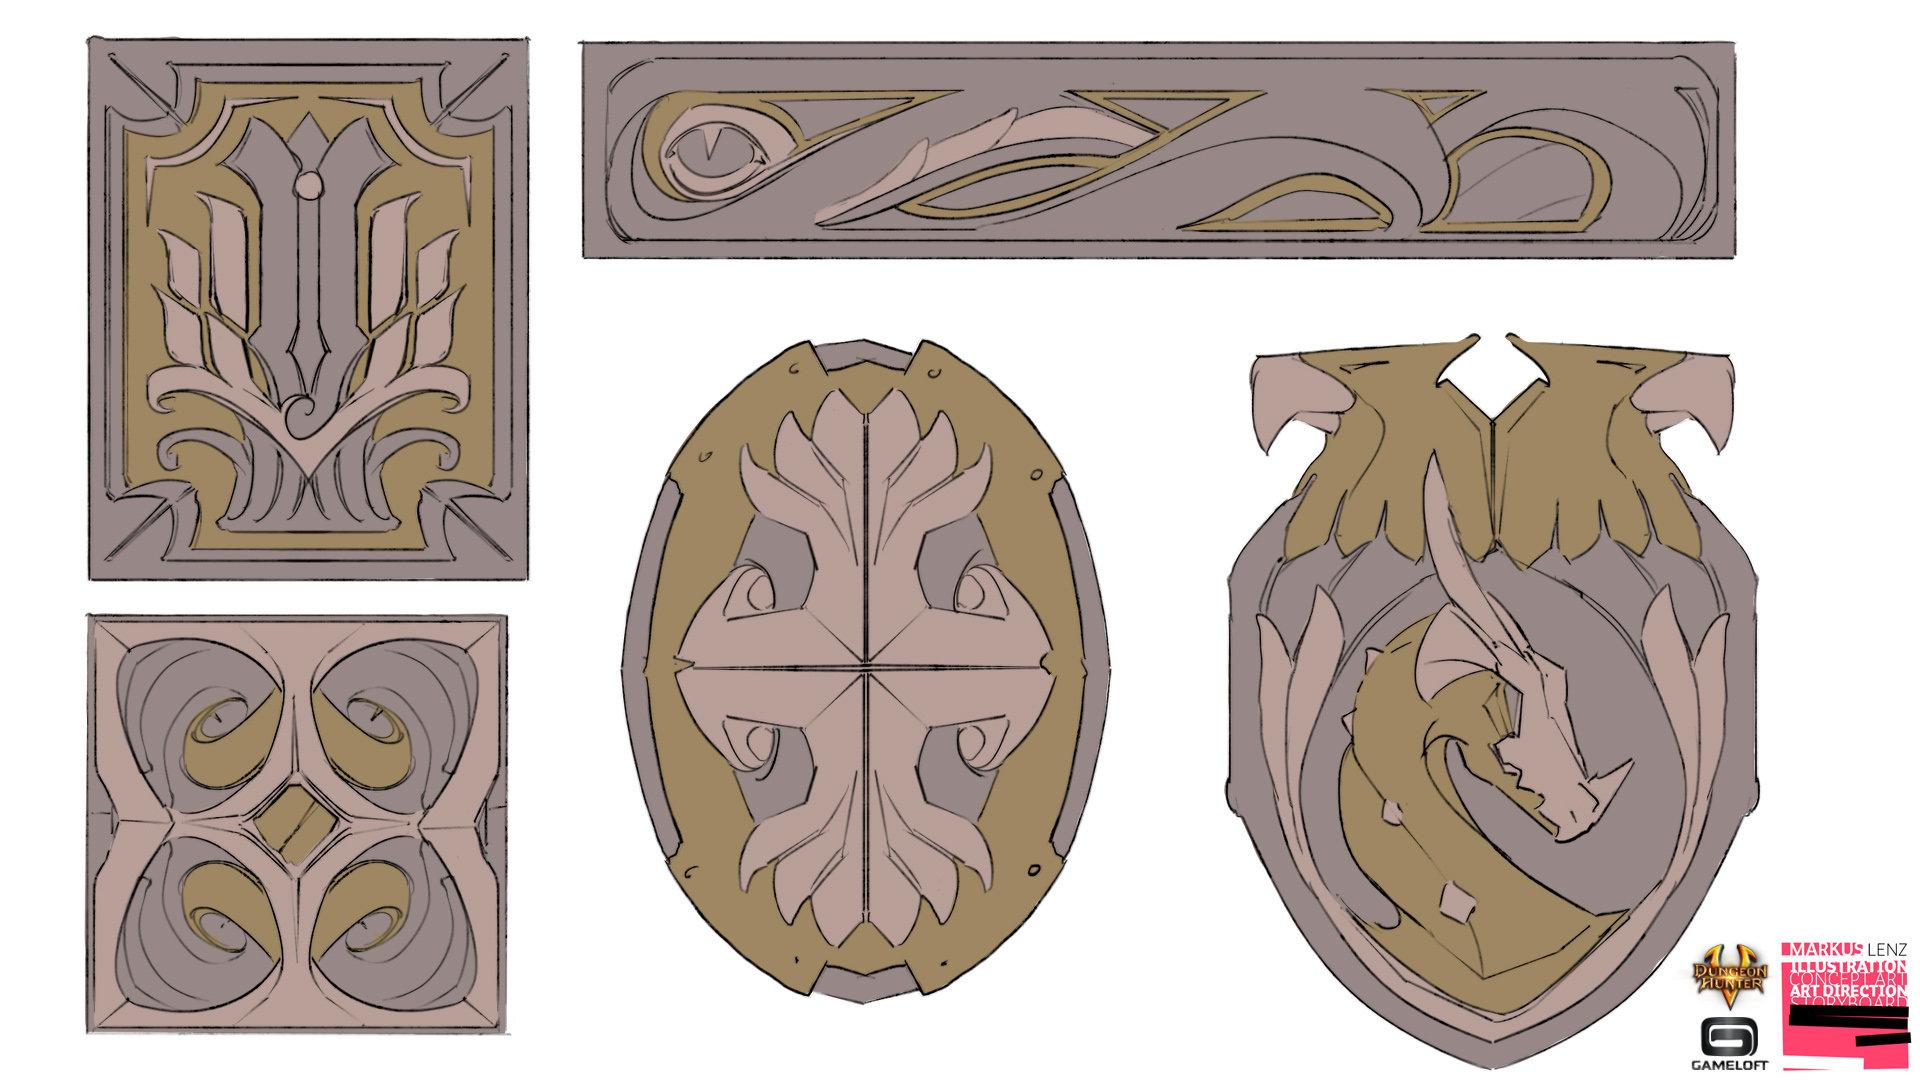 Markus lenz gameloft dh5 valenoutpost patterns 01 ml